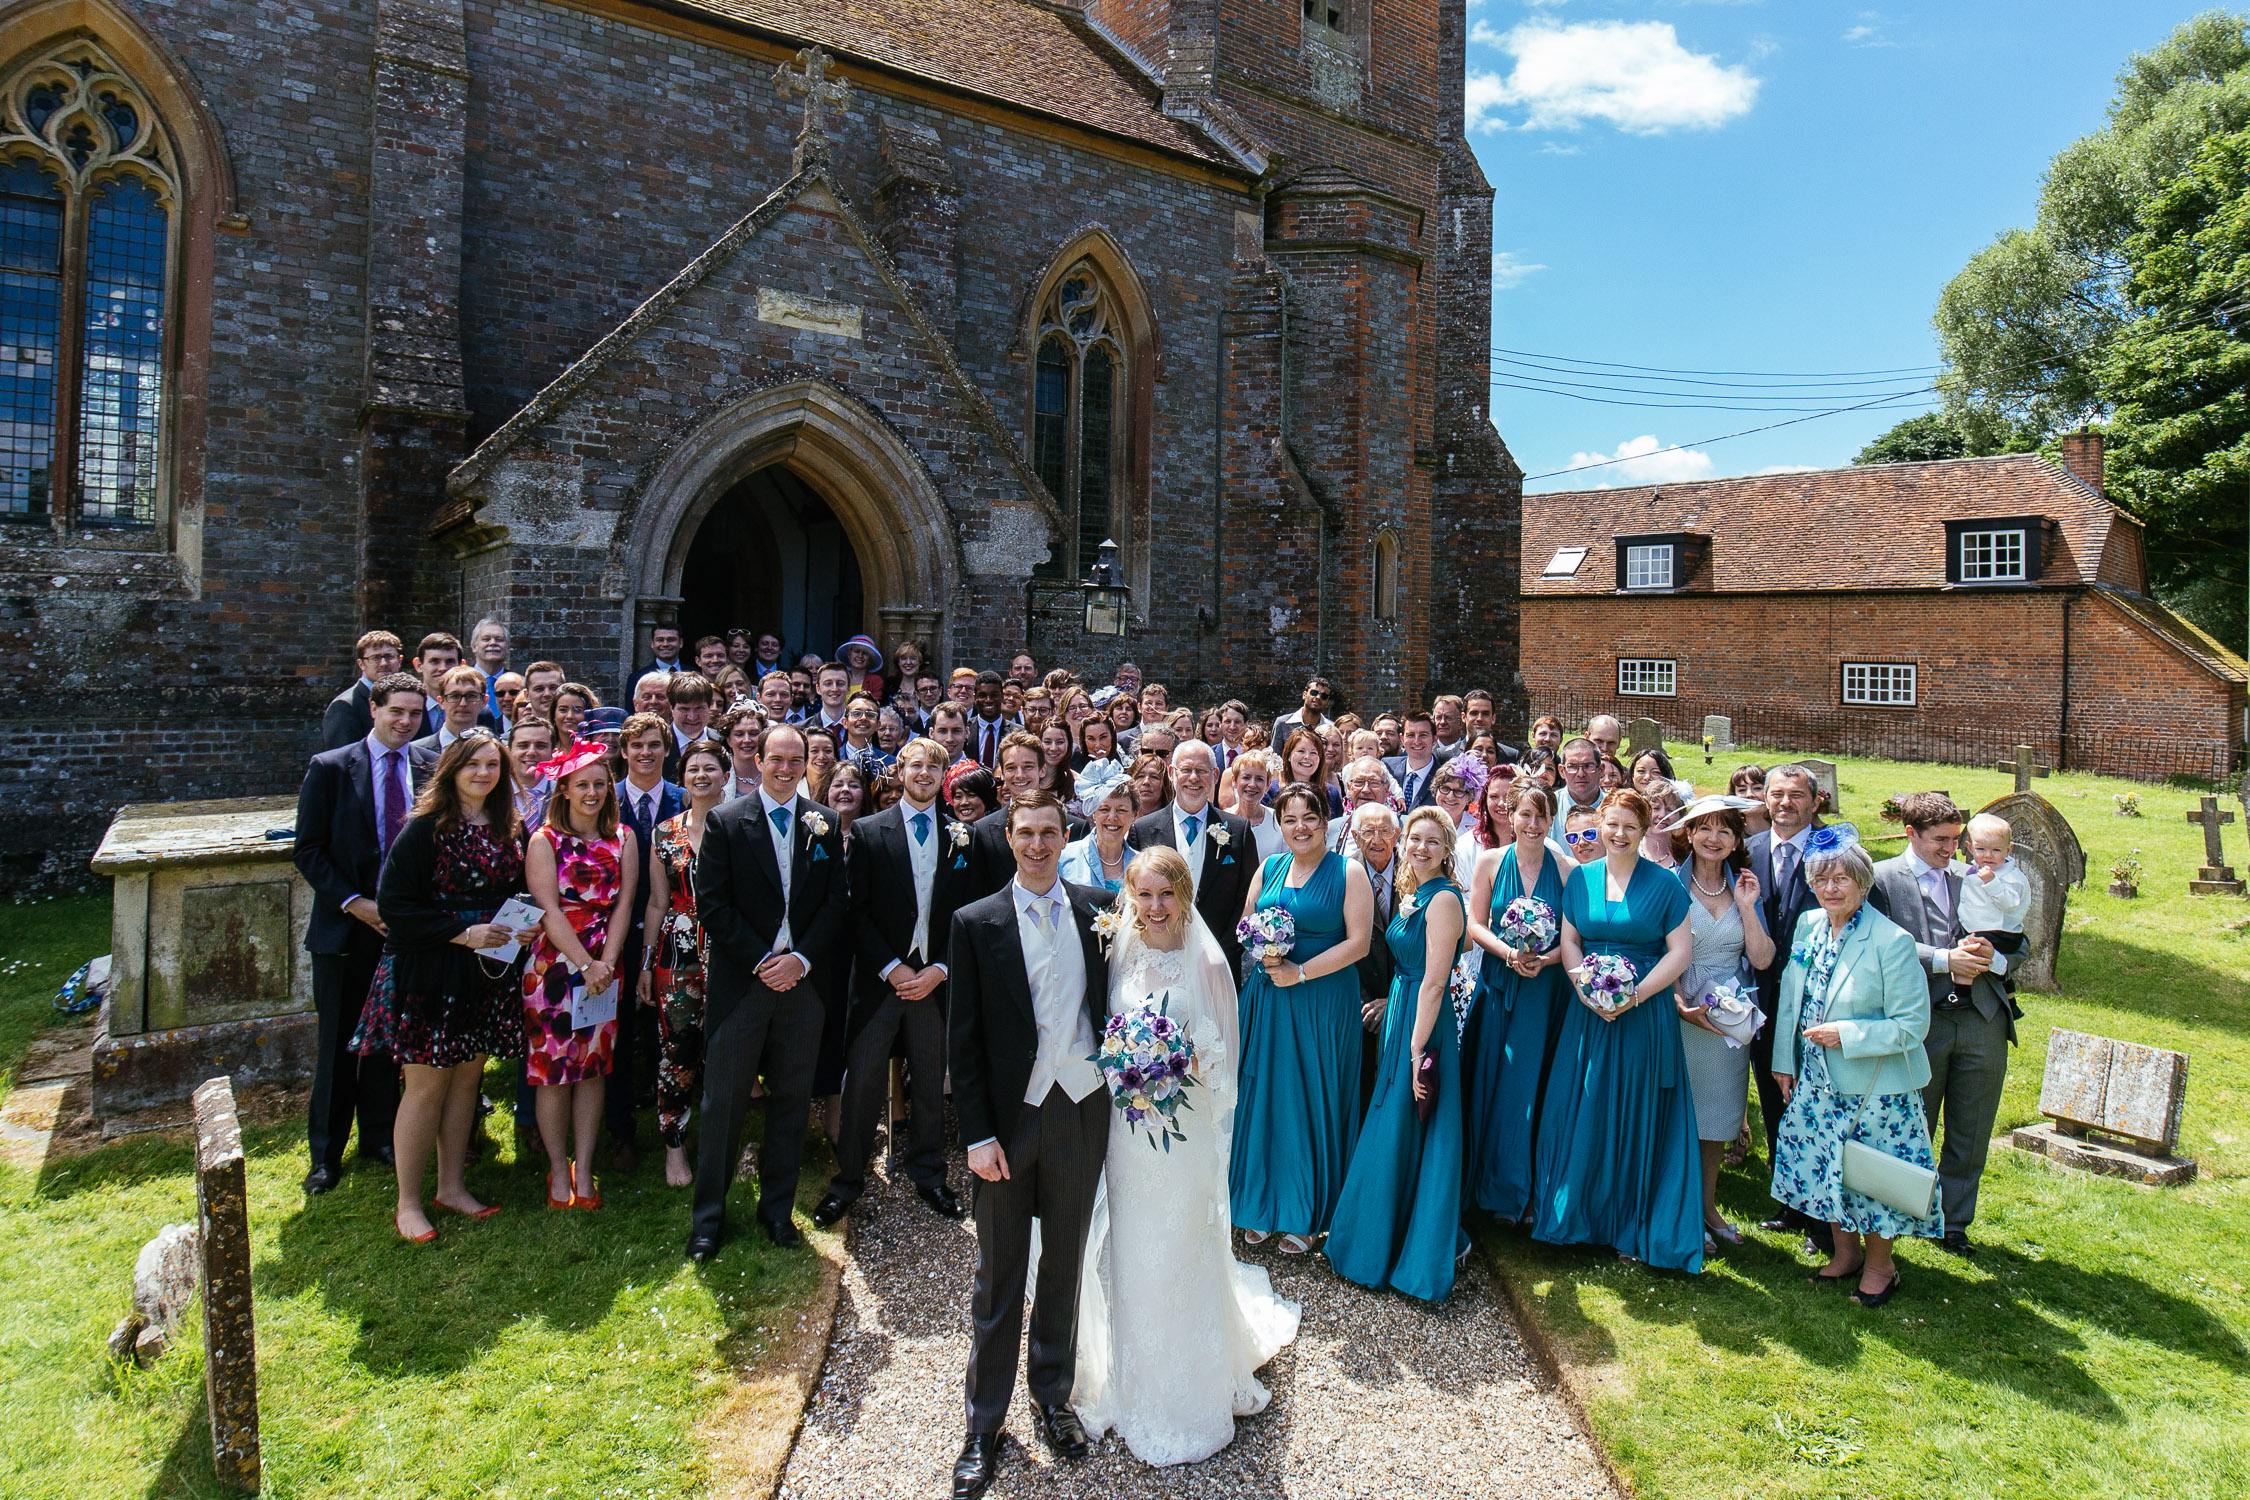 Lizi-and-Mark-Wedding-Highlights-41.jpg